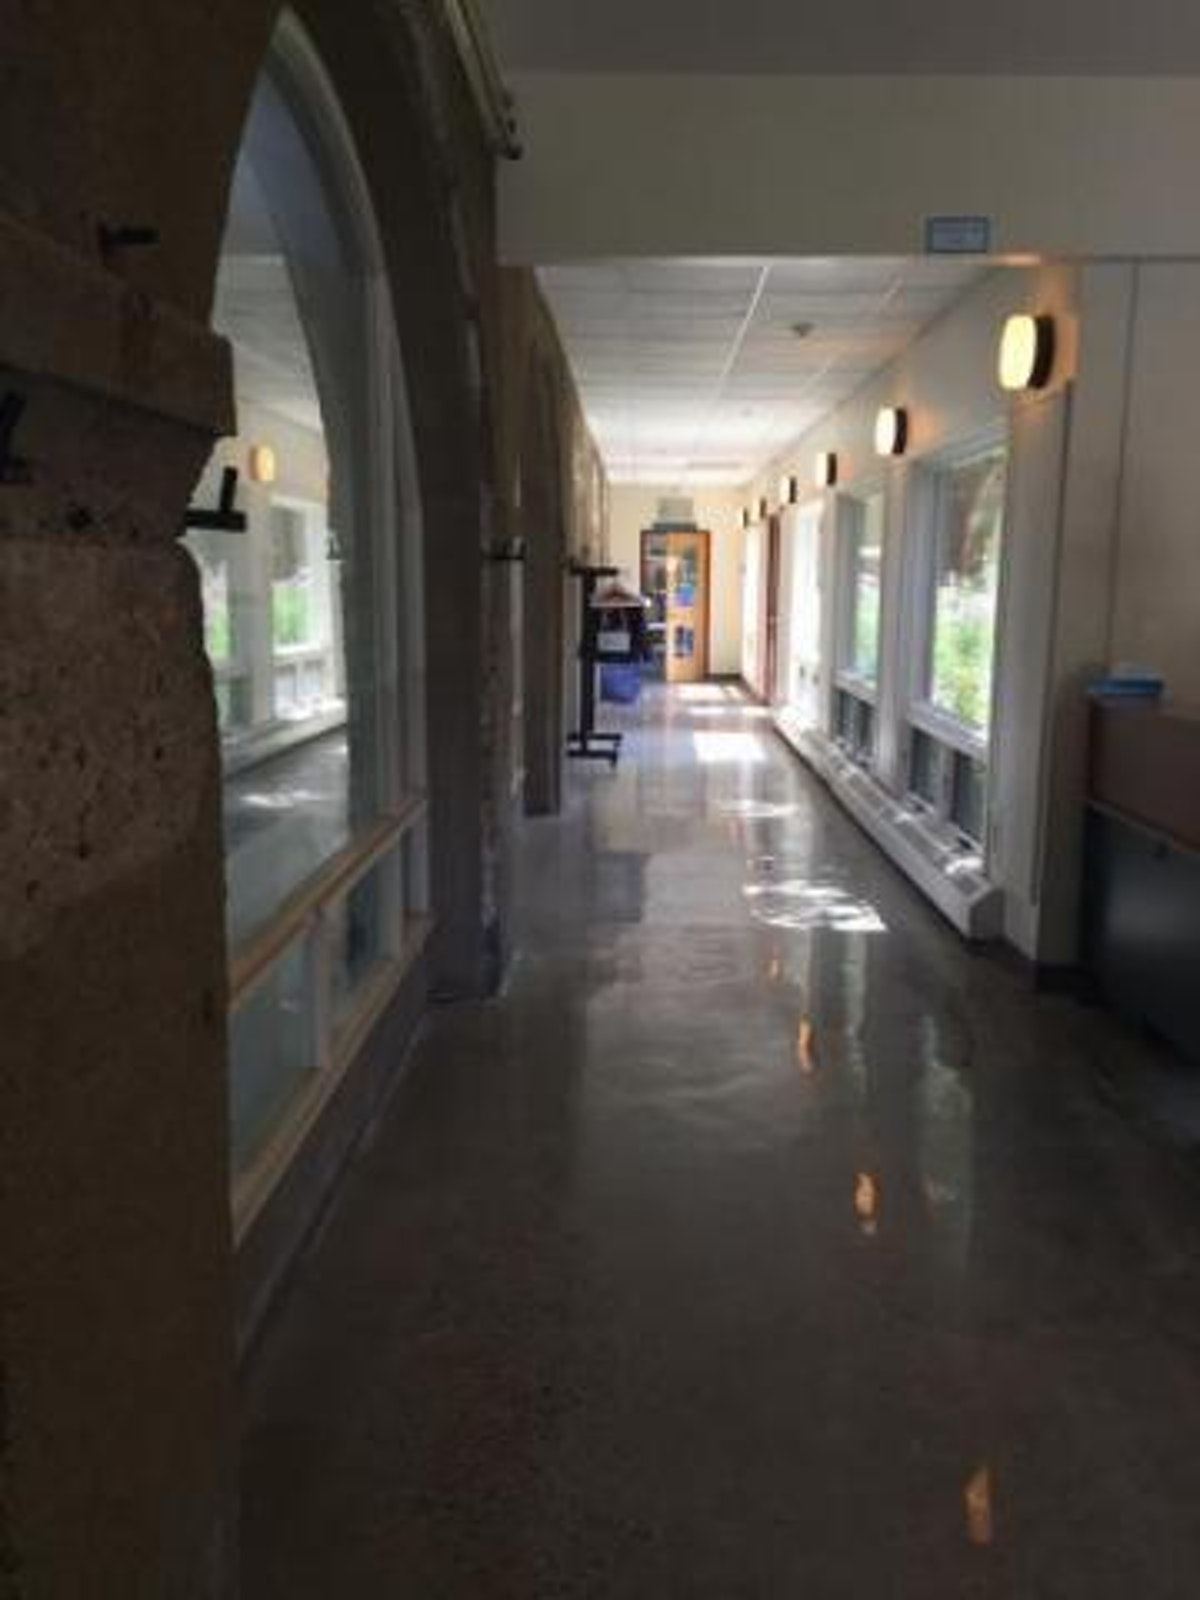 New epoxy floor coating Polished Concrete vs. Epoxy. Know Your Options